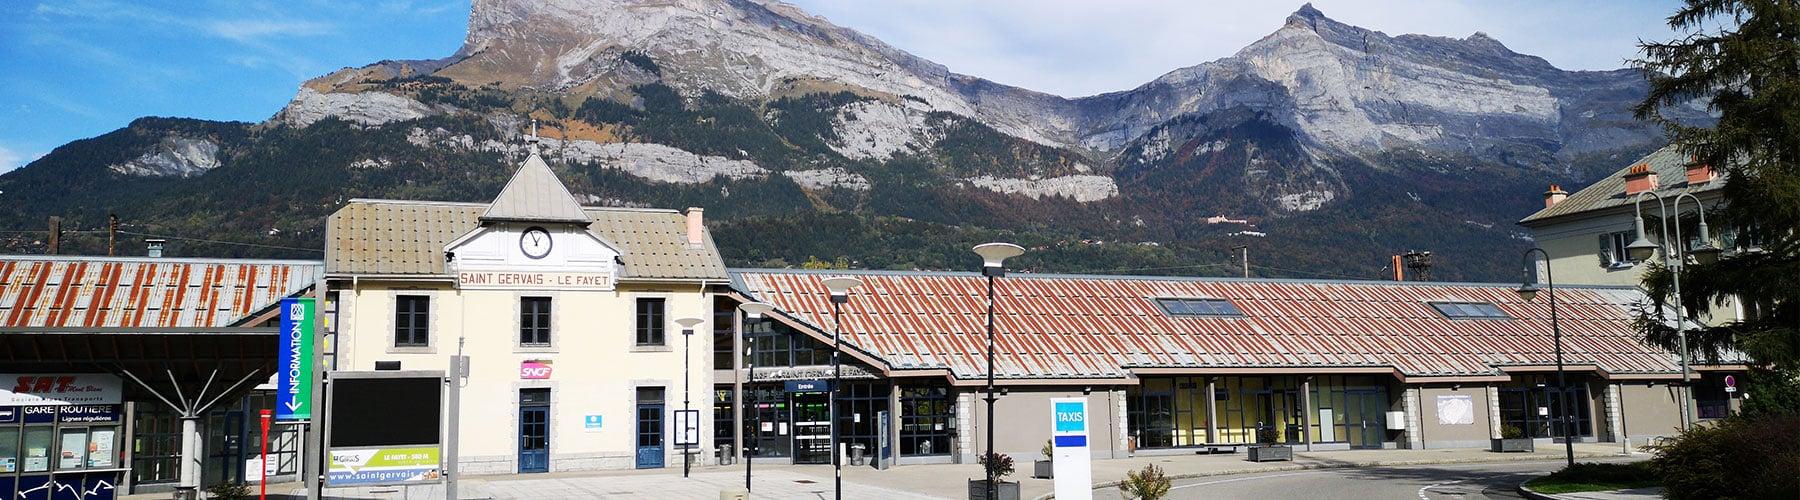 Destination in Saint-Gervais